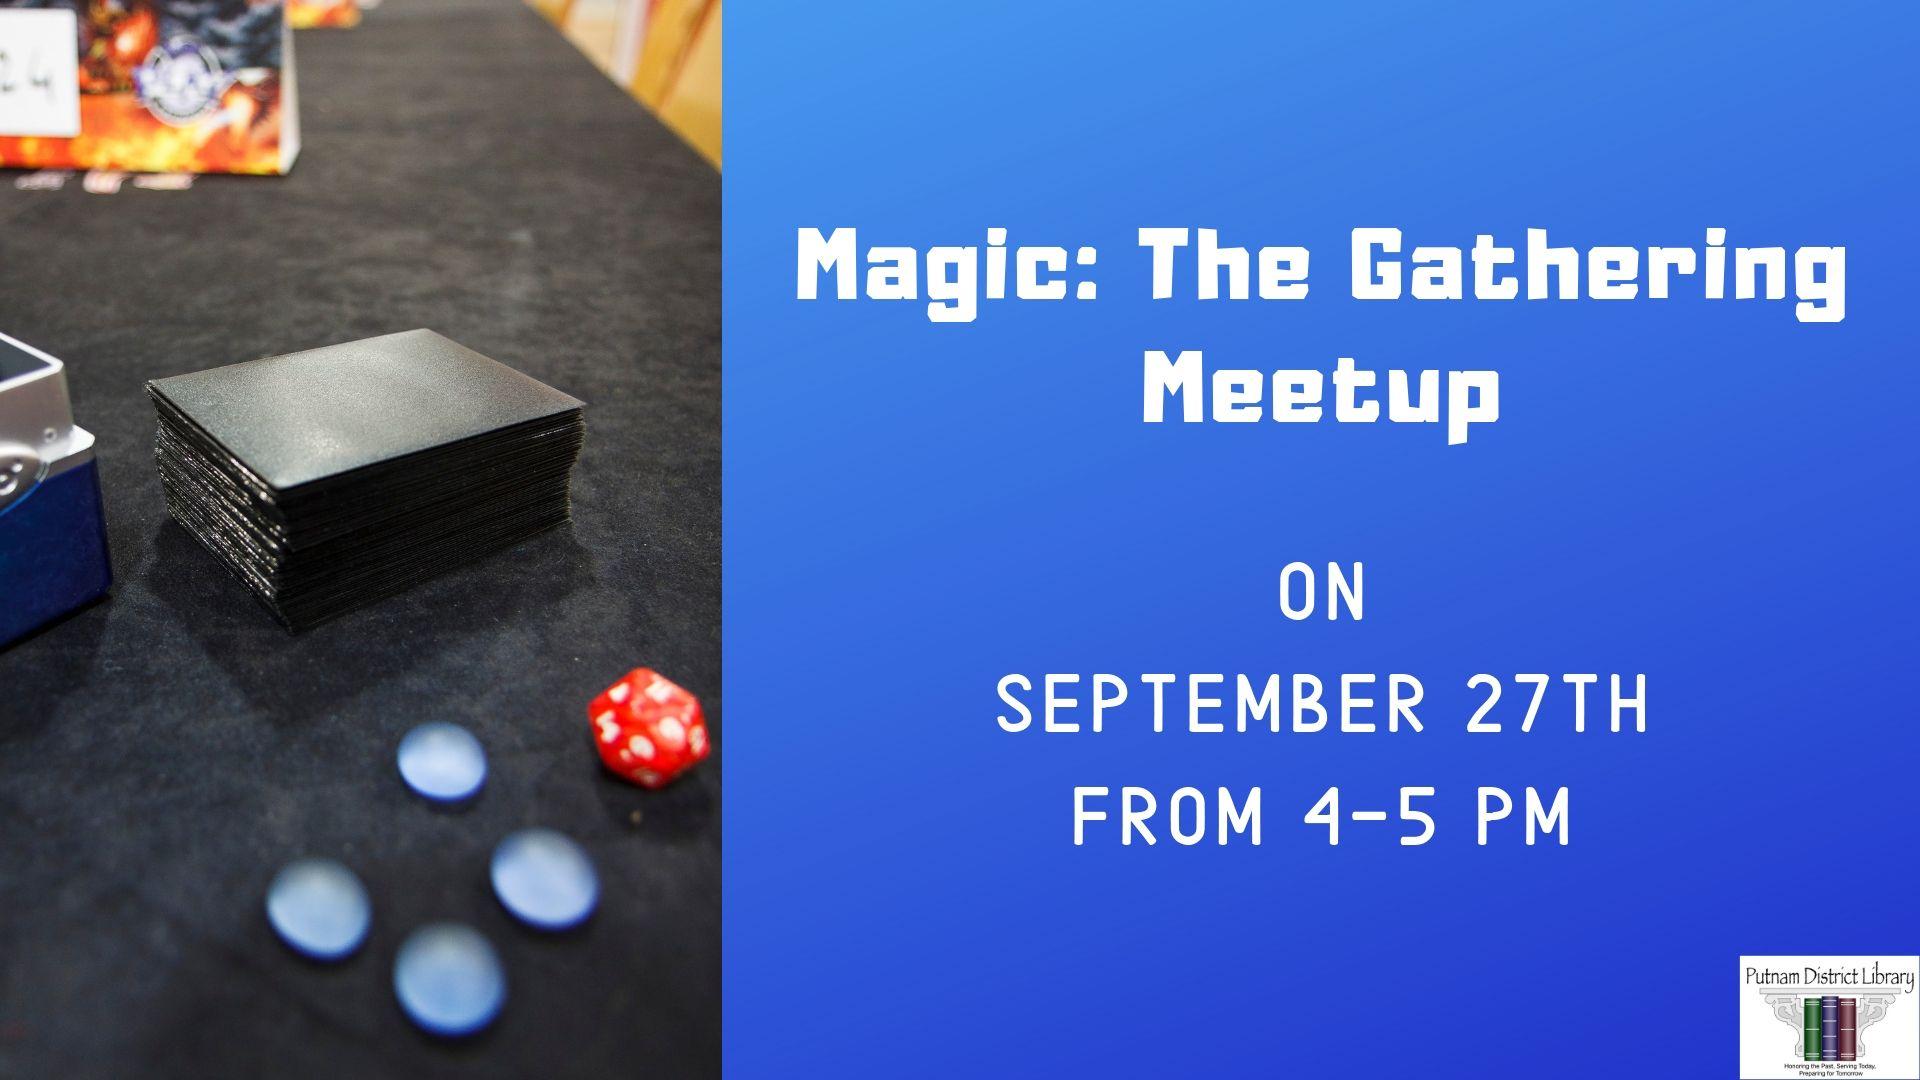 Magic: The Gathering Meetup